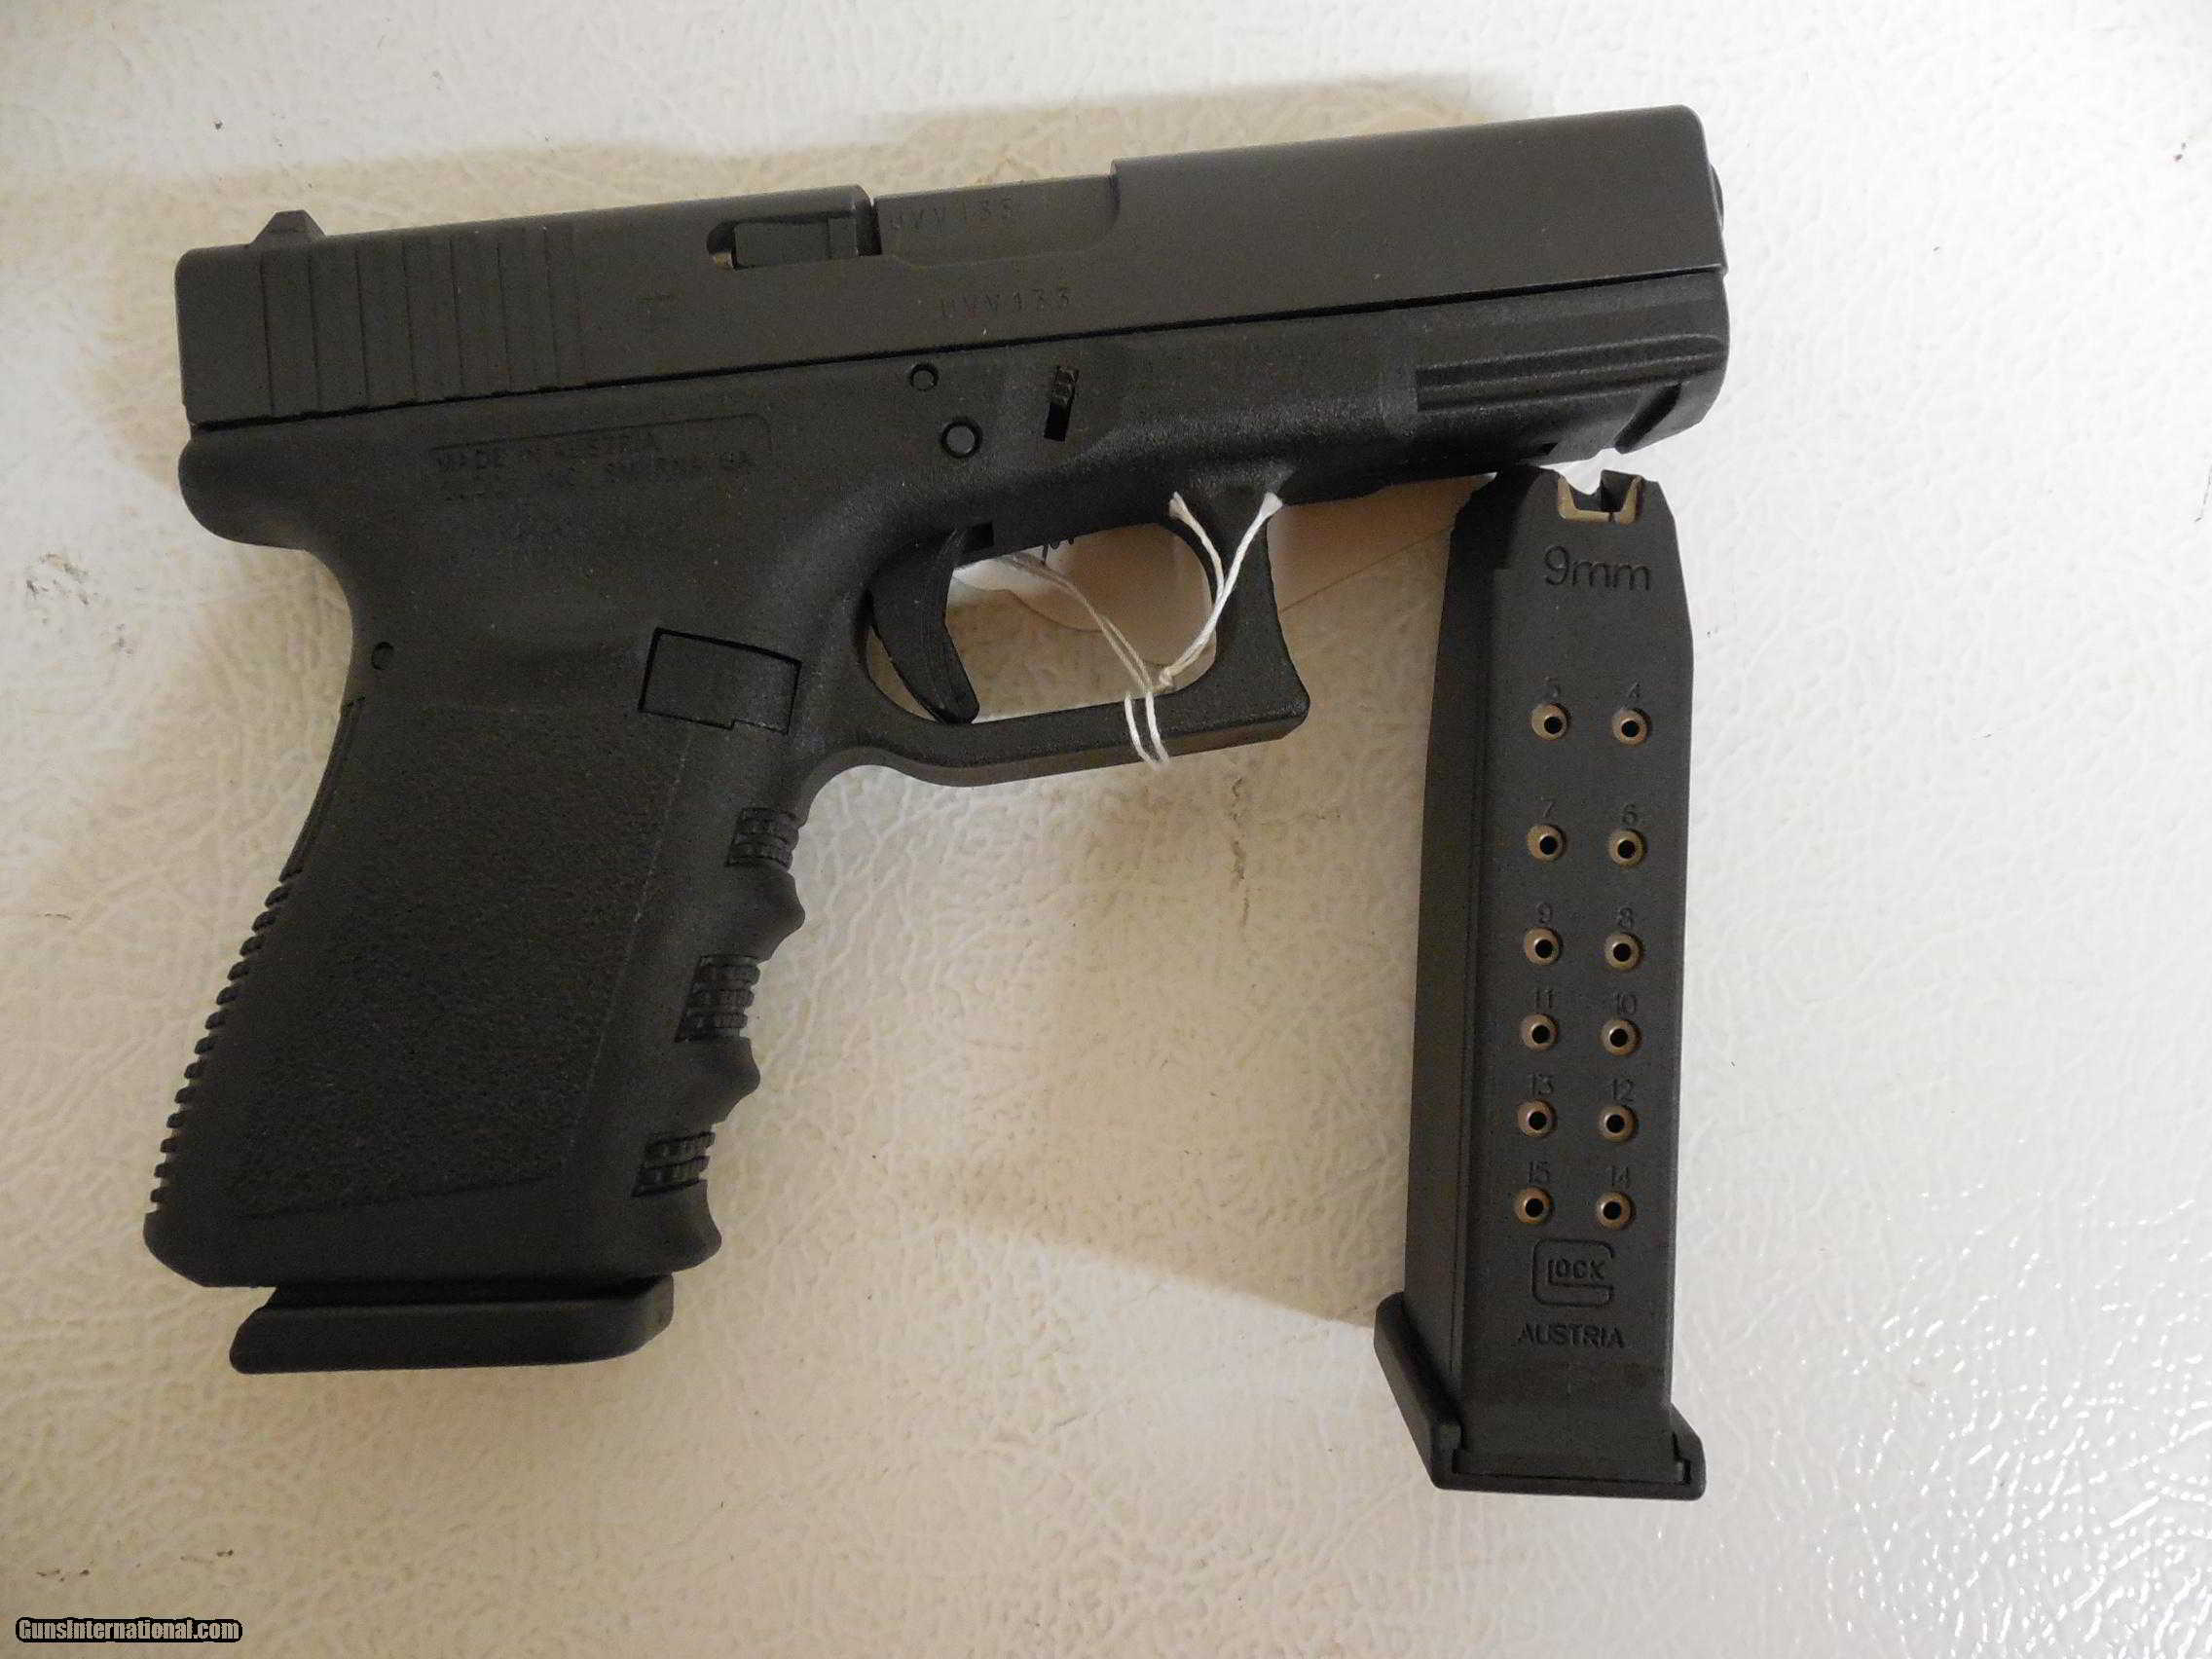 Glock 19 Pistol Outline Wiring Diagrams Simple Event Counter Circuit Diagram Tradeoficcom G Generation 3 9 Mm 2 15 1 Round Magazines 4 0 Rh Gunsinternational Com 18 22 Dimensions